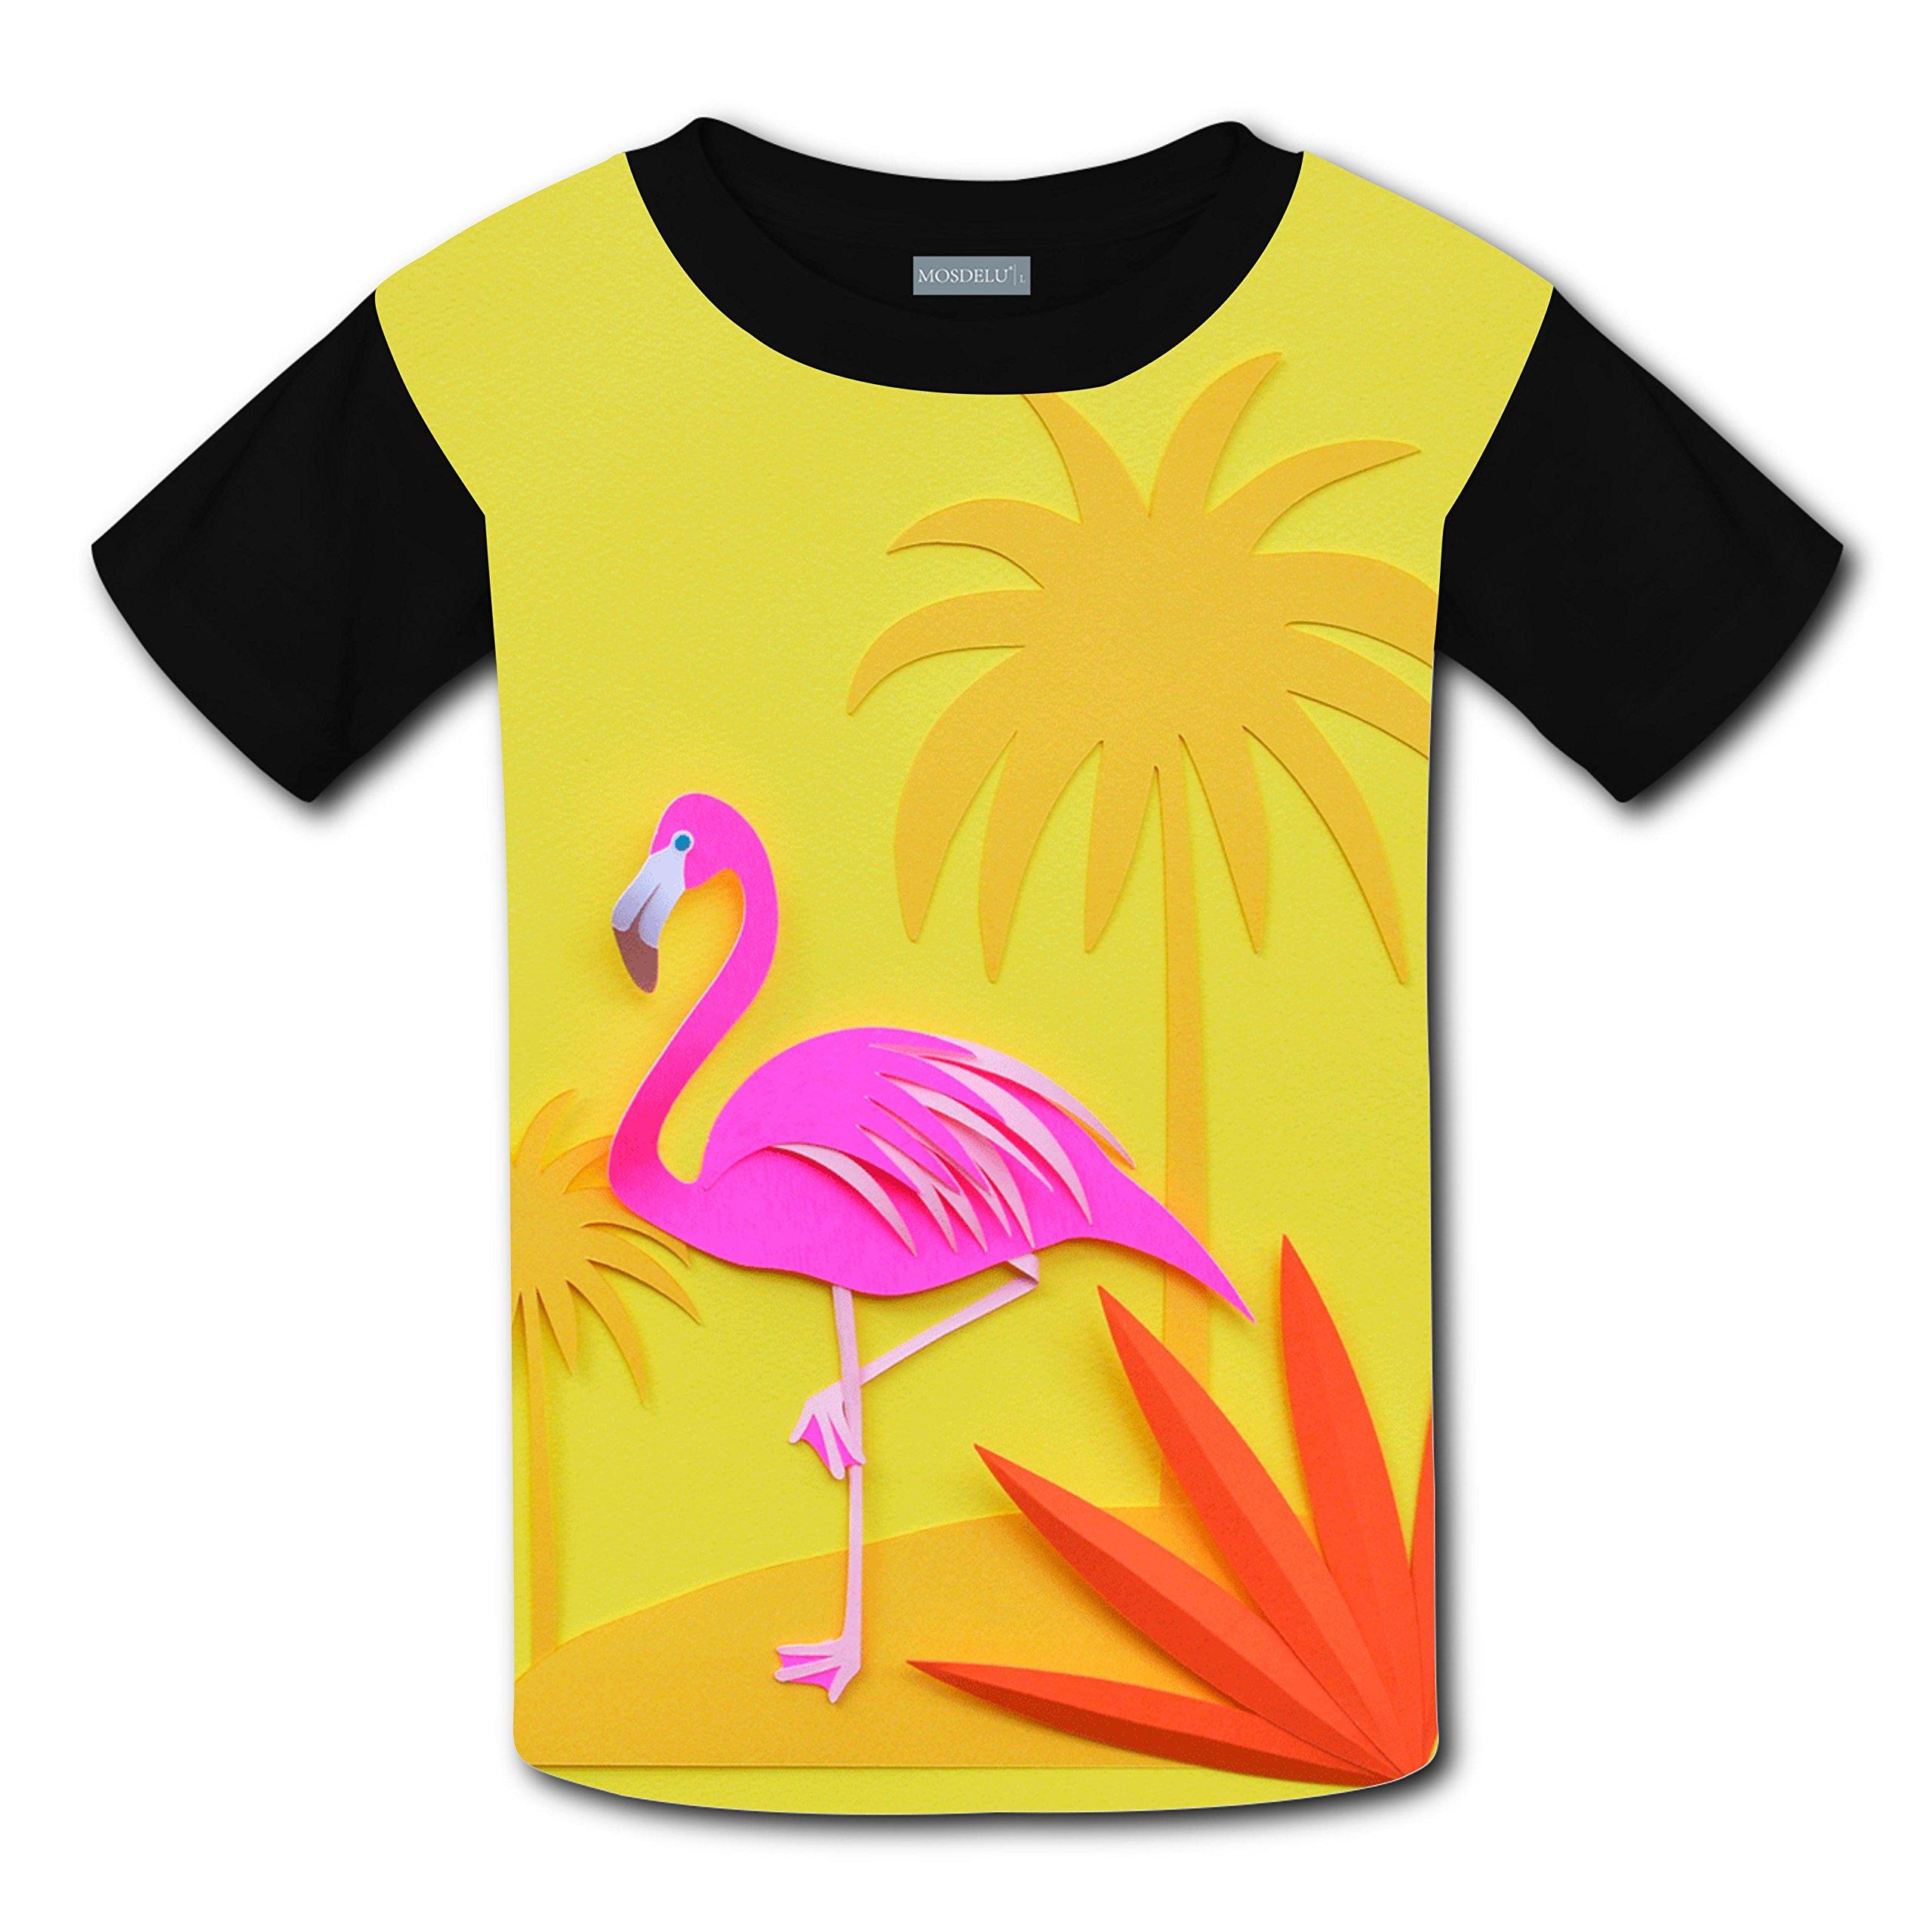 RODONO Unisex Kids Yello Flamingo Birthday Funny Round Collar Short Sleeve T- Shirt